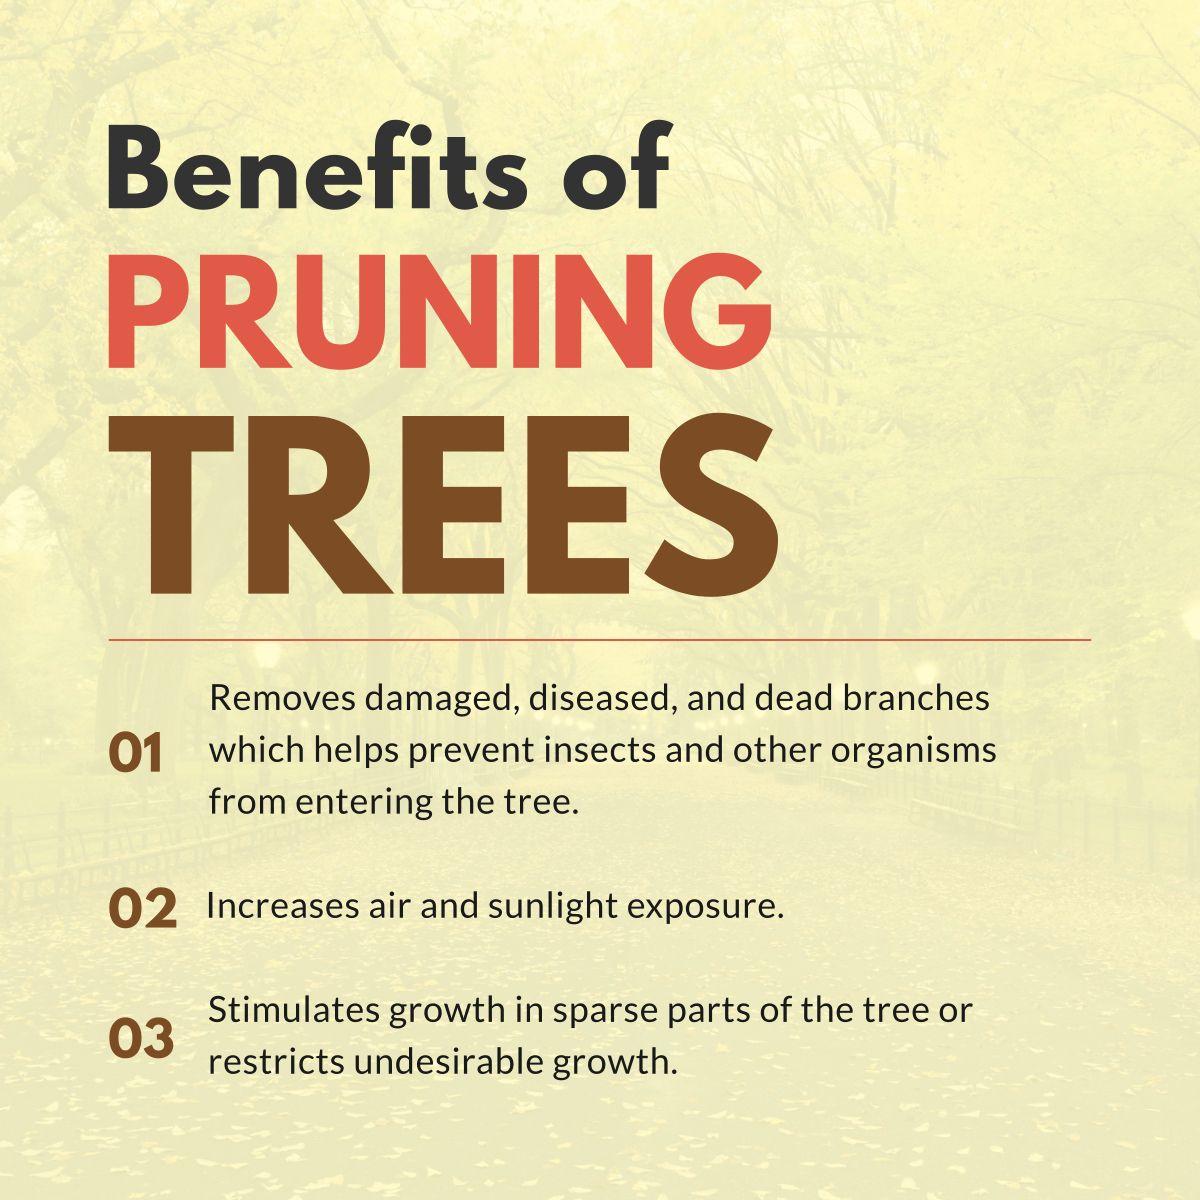 Benefits of pruning trees benefits pruningtress